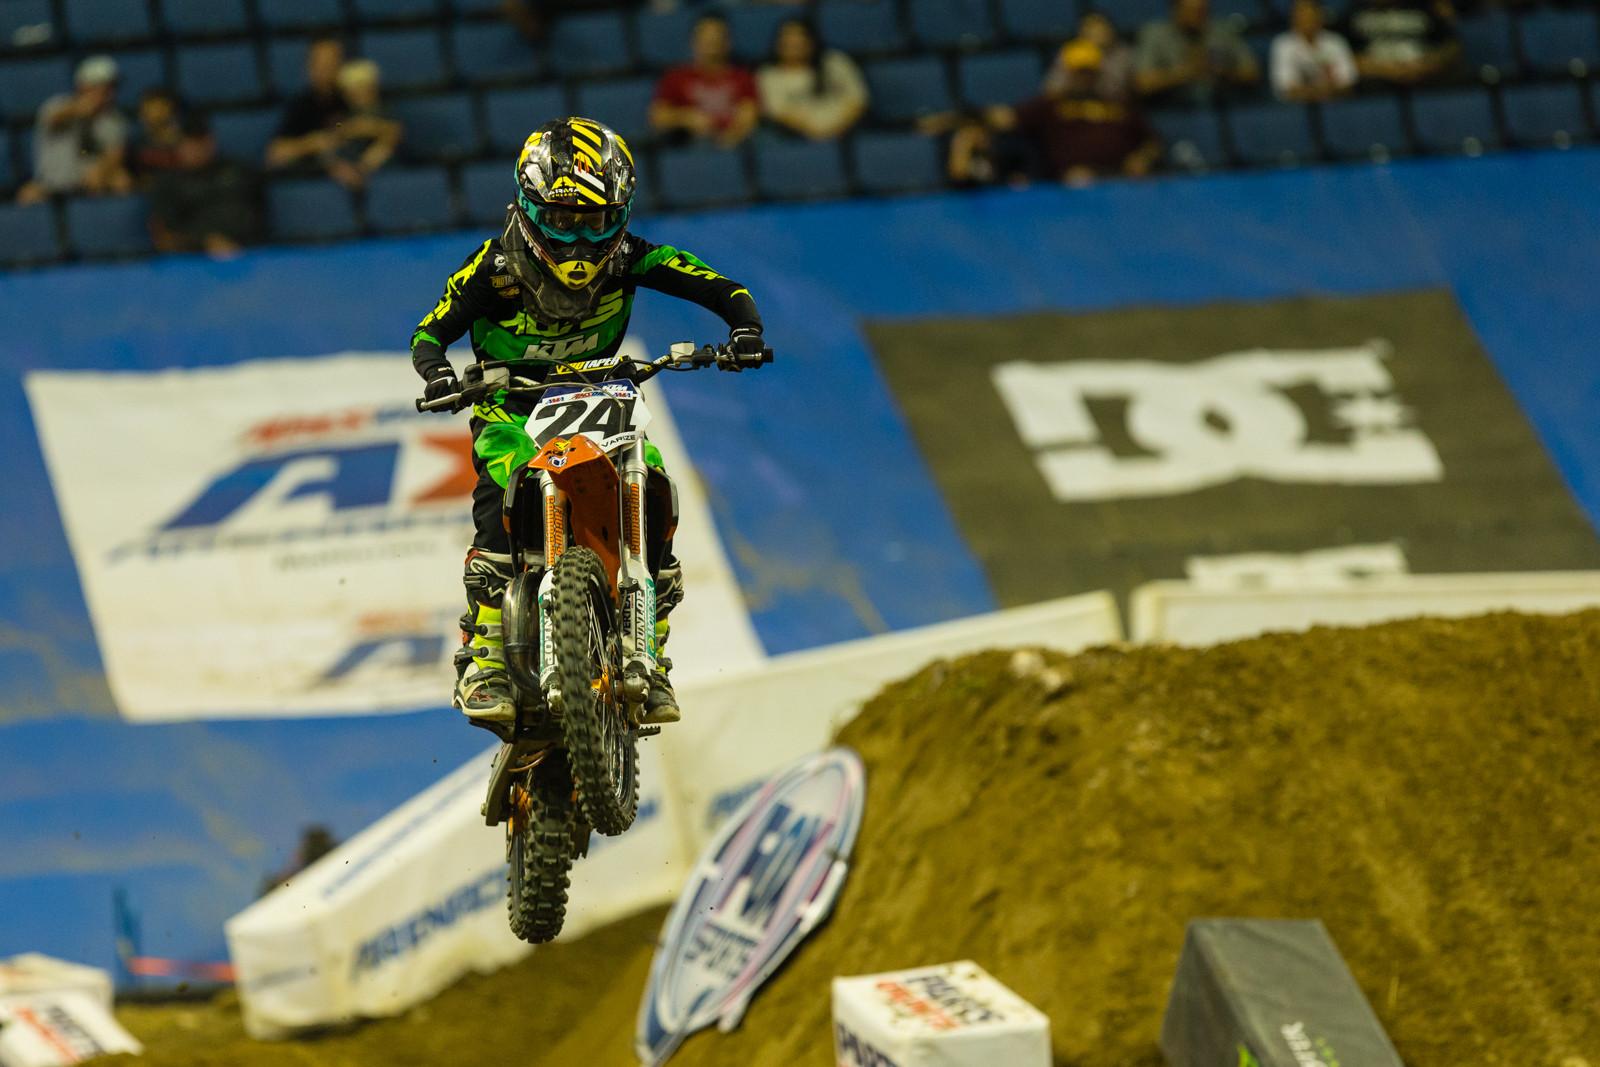 Josh Varize - Photo Gallery: Ontario Arenacross - Saturday Night - Motocross Pictures - Vital MX